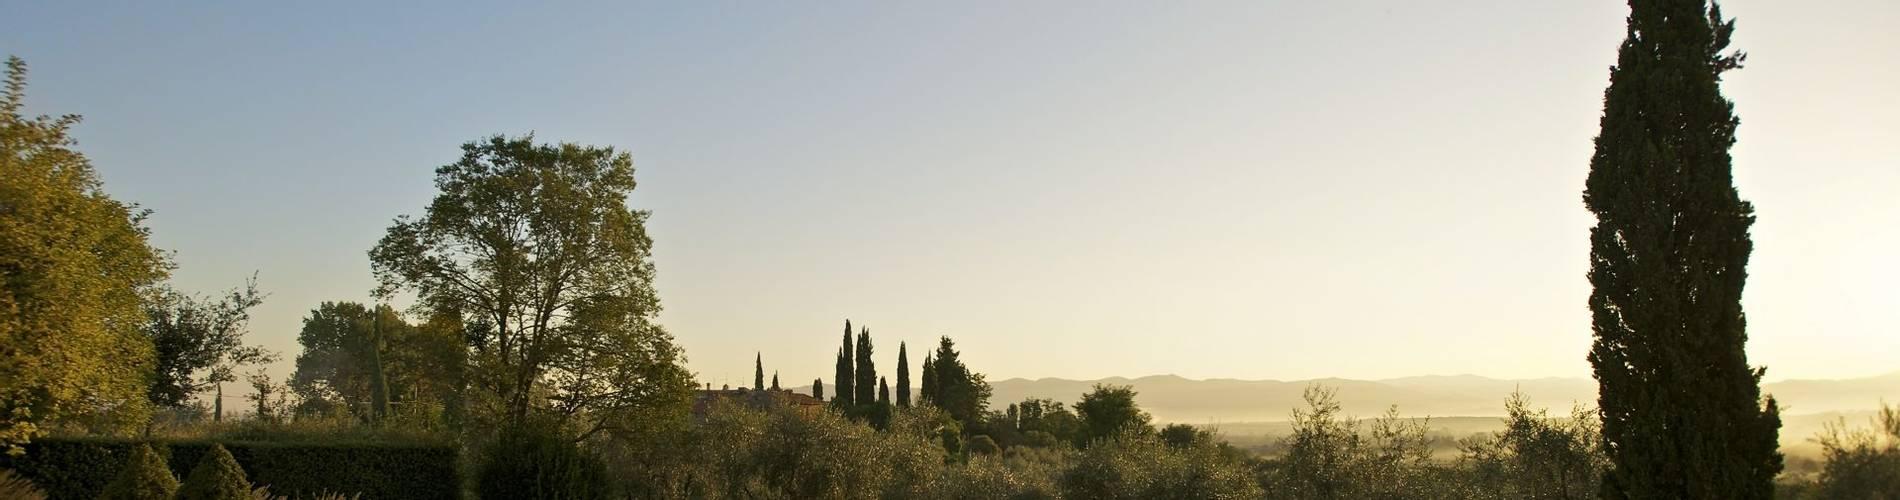 Fontelunga, Tuscany, Italy (11).jpg